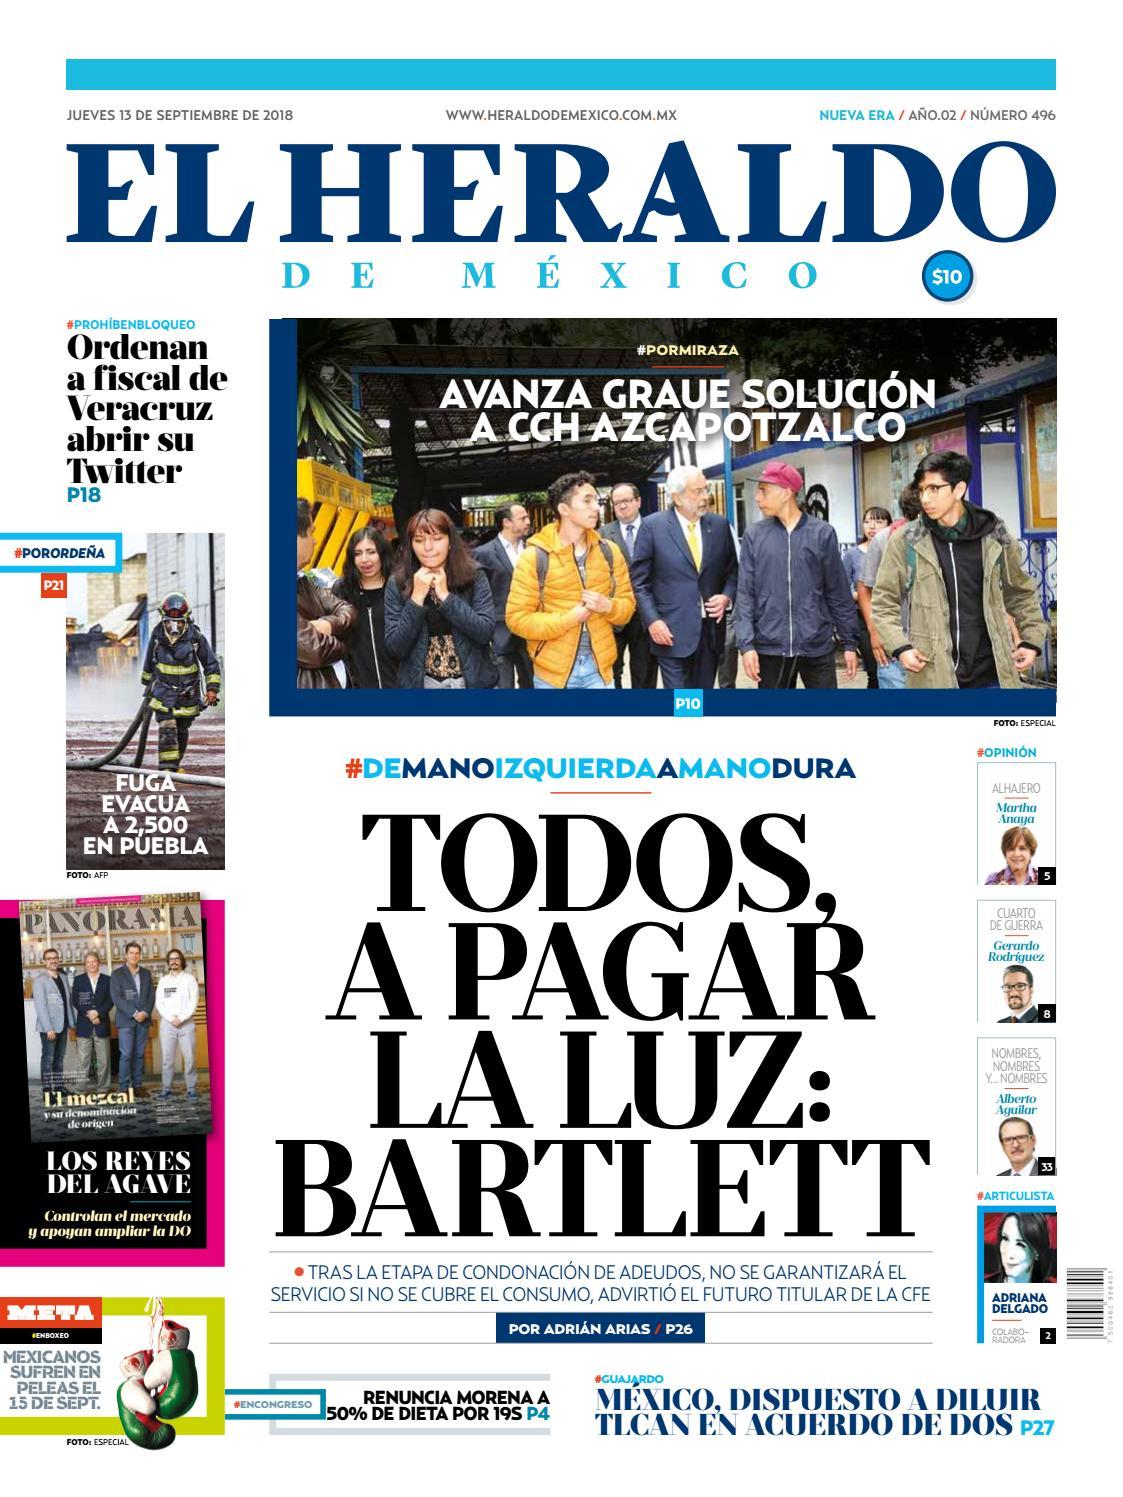 13 de septiembre de 2018 by El Heraldo de México - issuu 7c91f4093e9